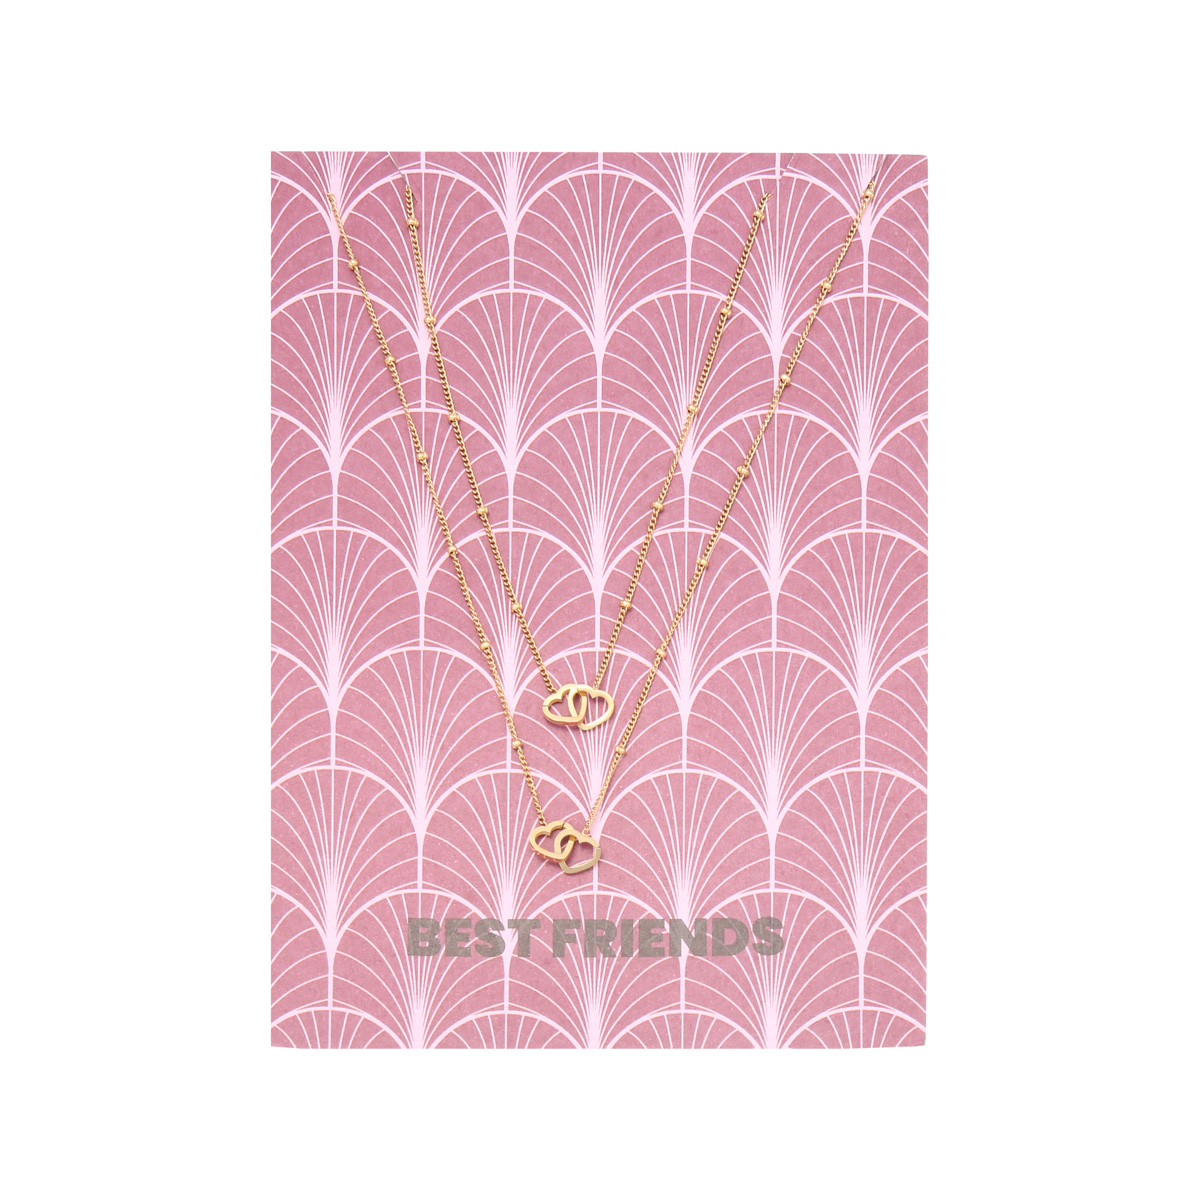 Collier Card Best Friends